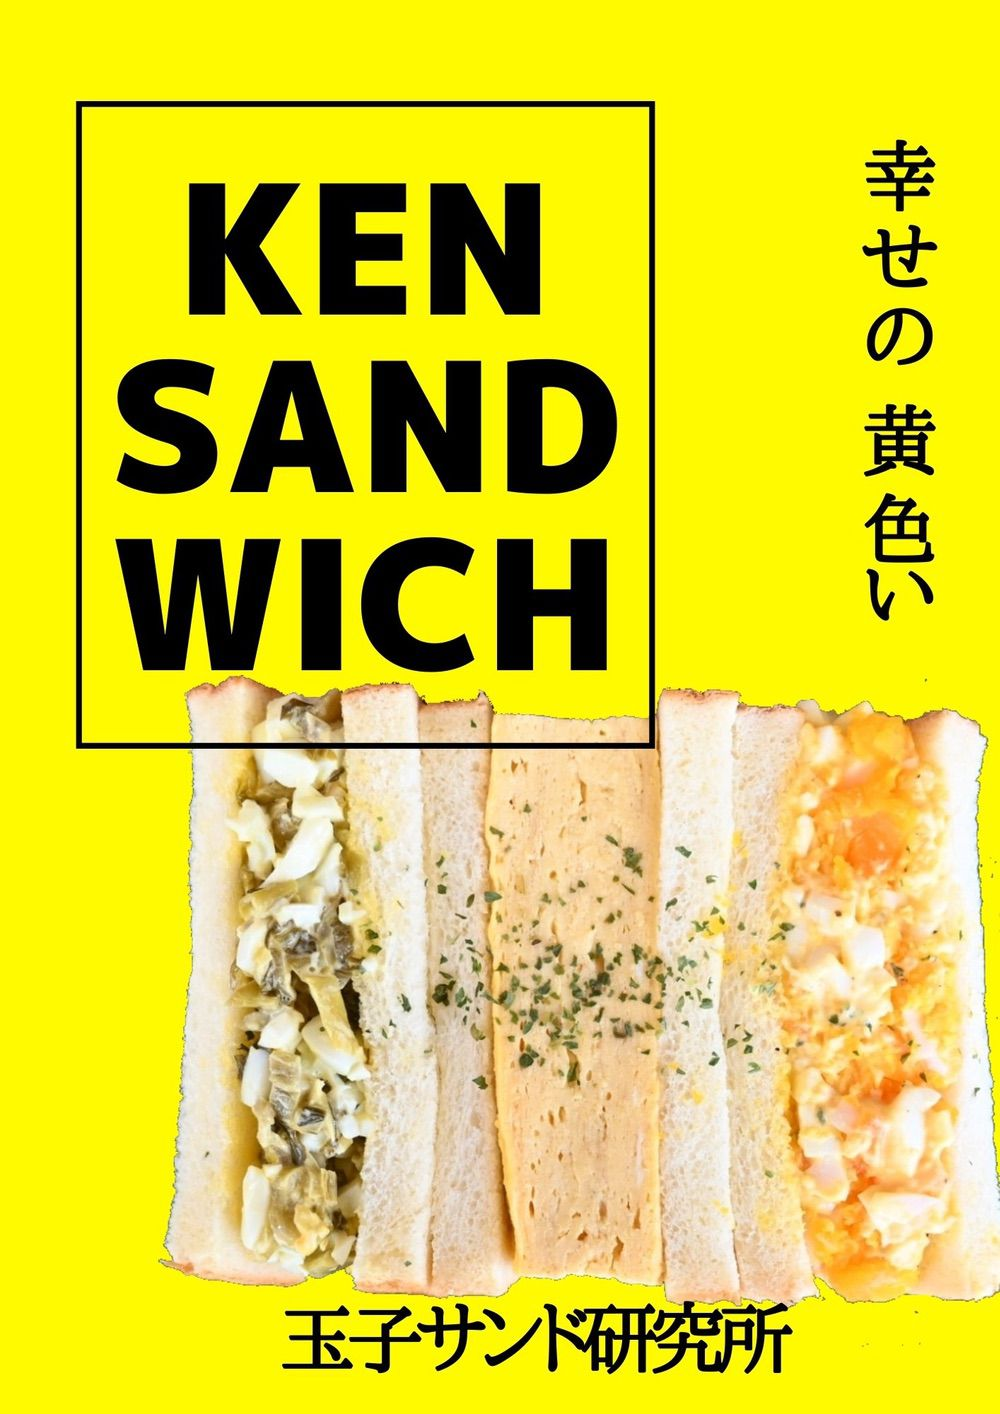 KEN SANDWICH 玉子サンド研究所 販売場所・販売時間・定休日